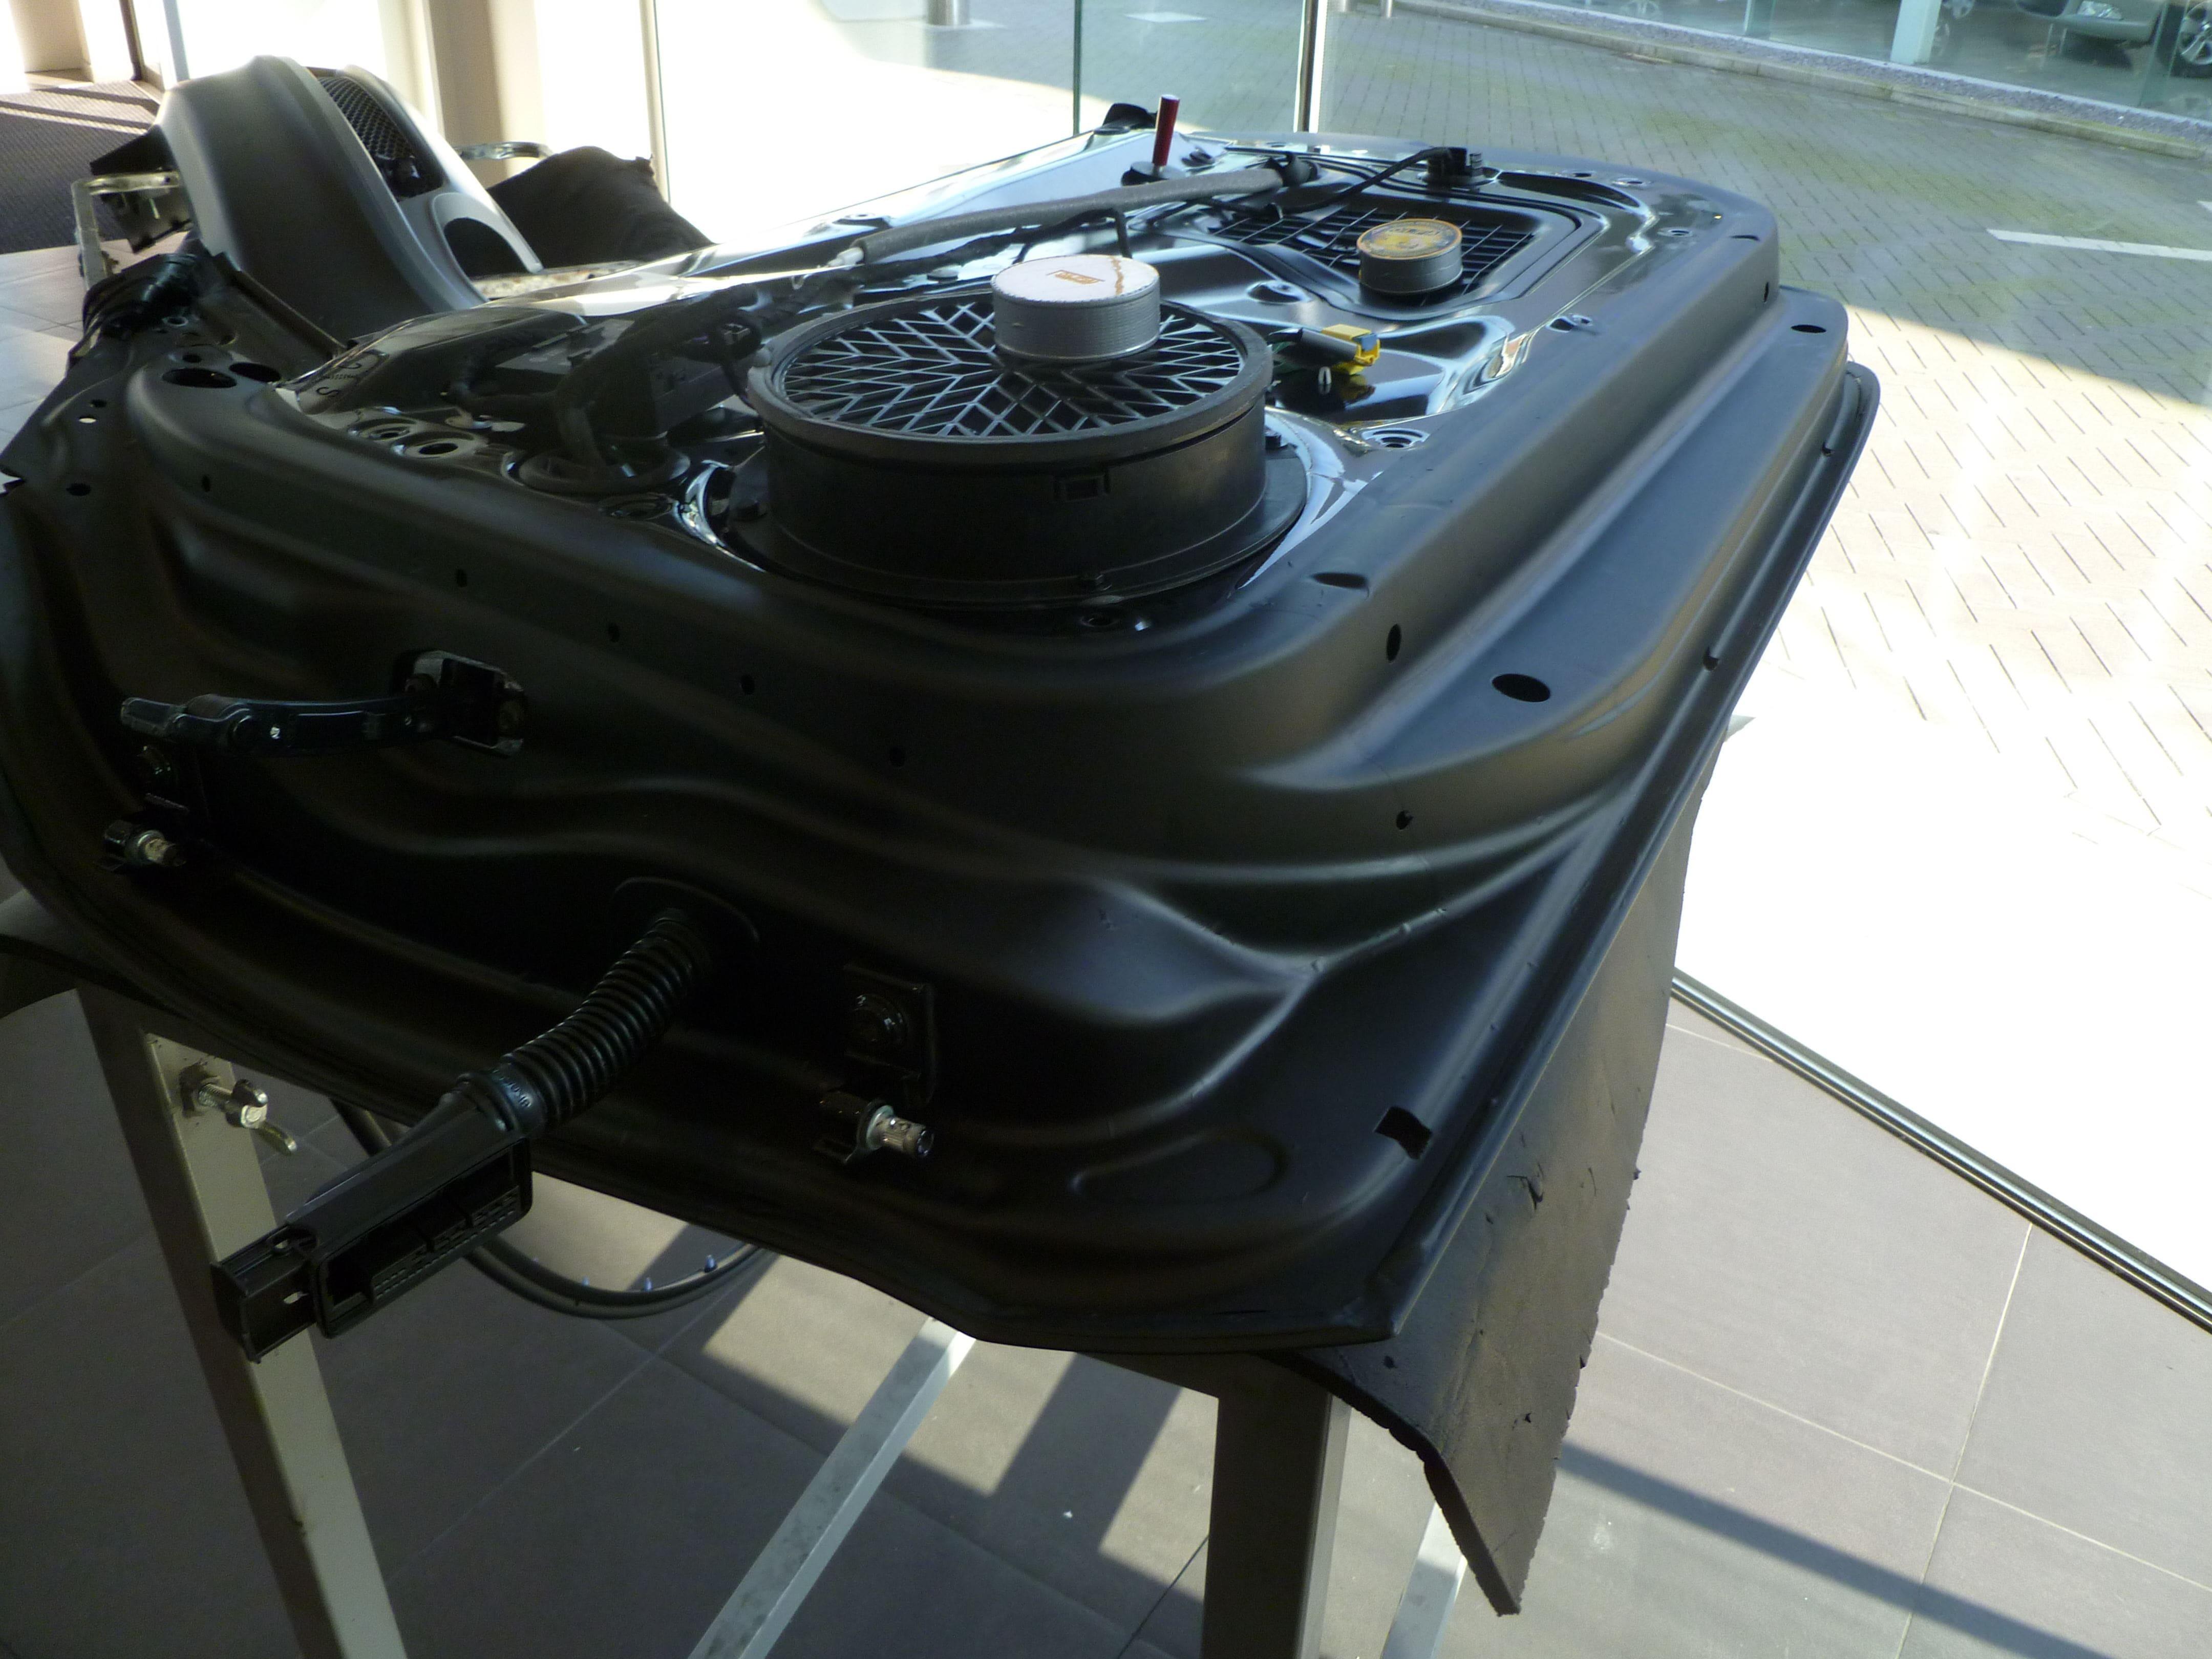 Audi A5 Coupe met Mat Zwarte Wrap, Carwrapping door Wrapmyride.nu Foto-nr:4636, ©2021